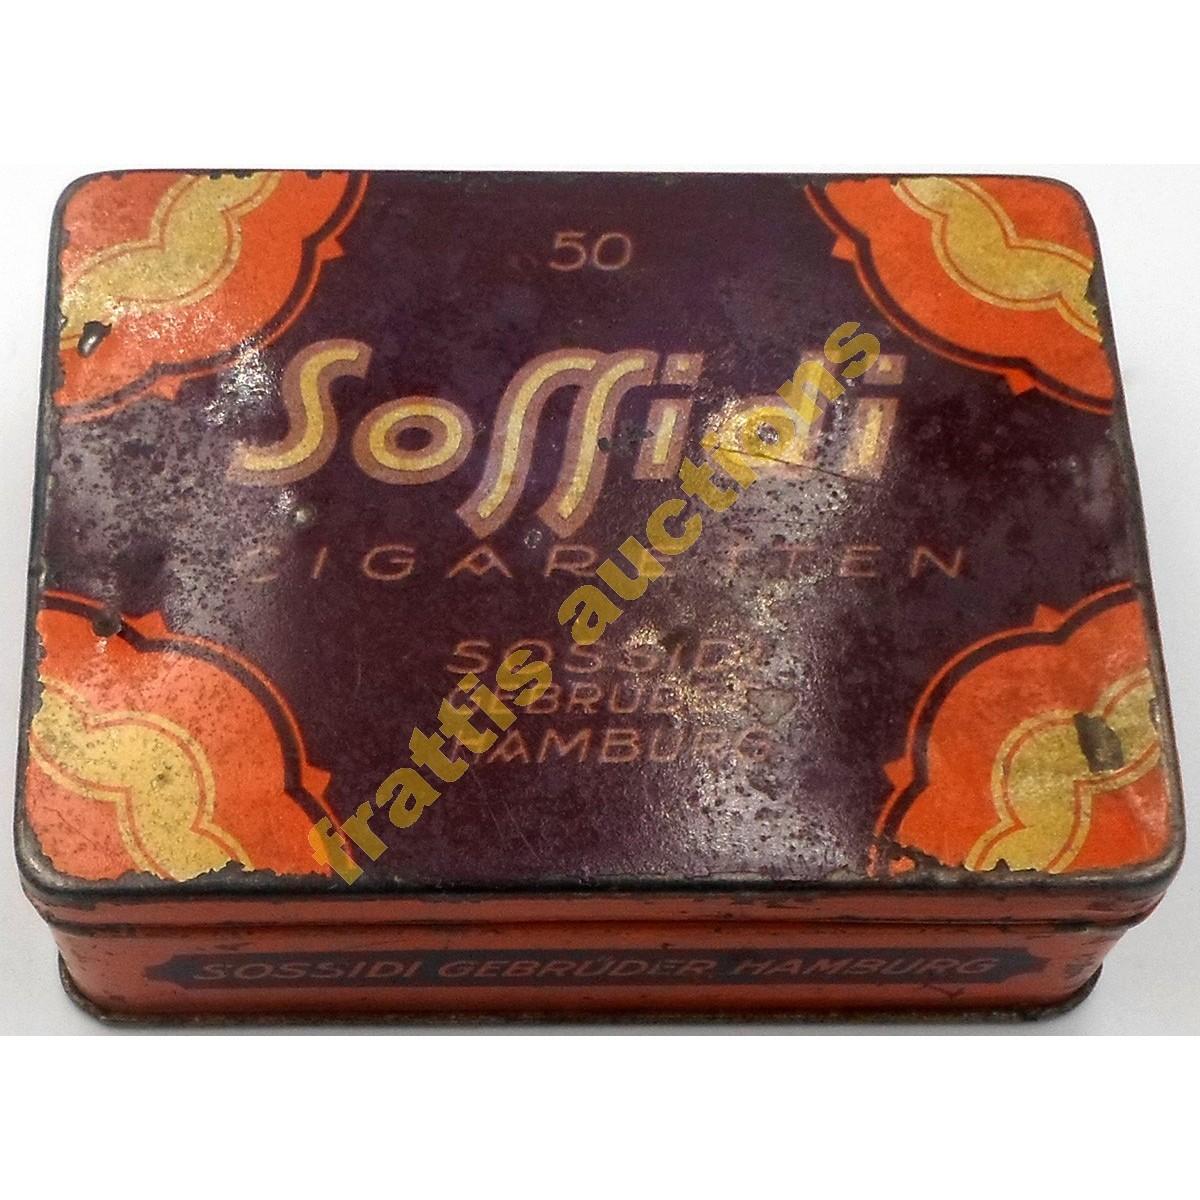 Sossidi, μεταλλικό κουτί 50 τσιγάρων.